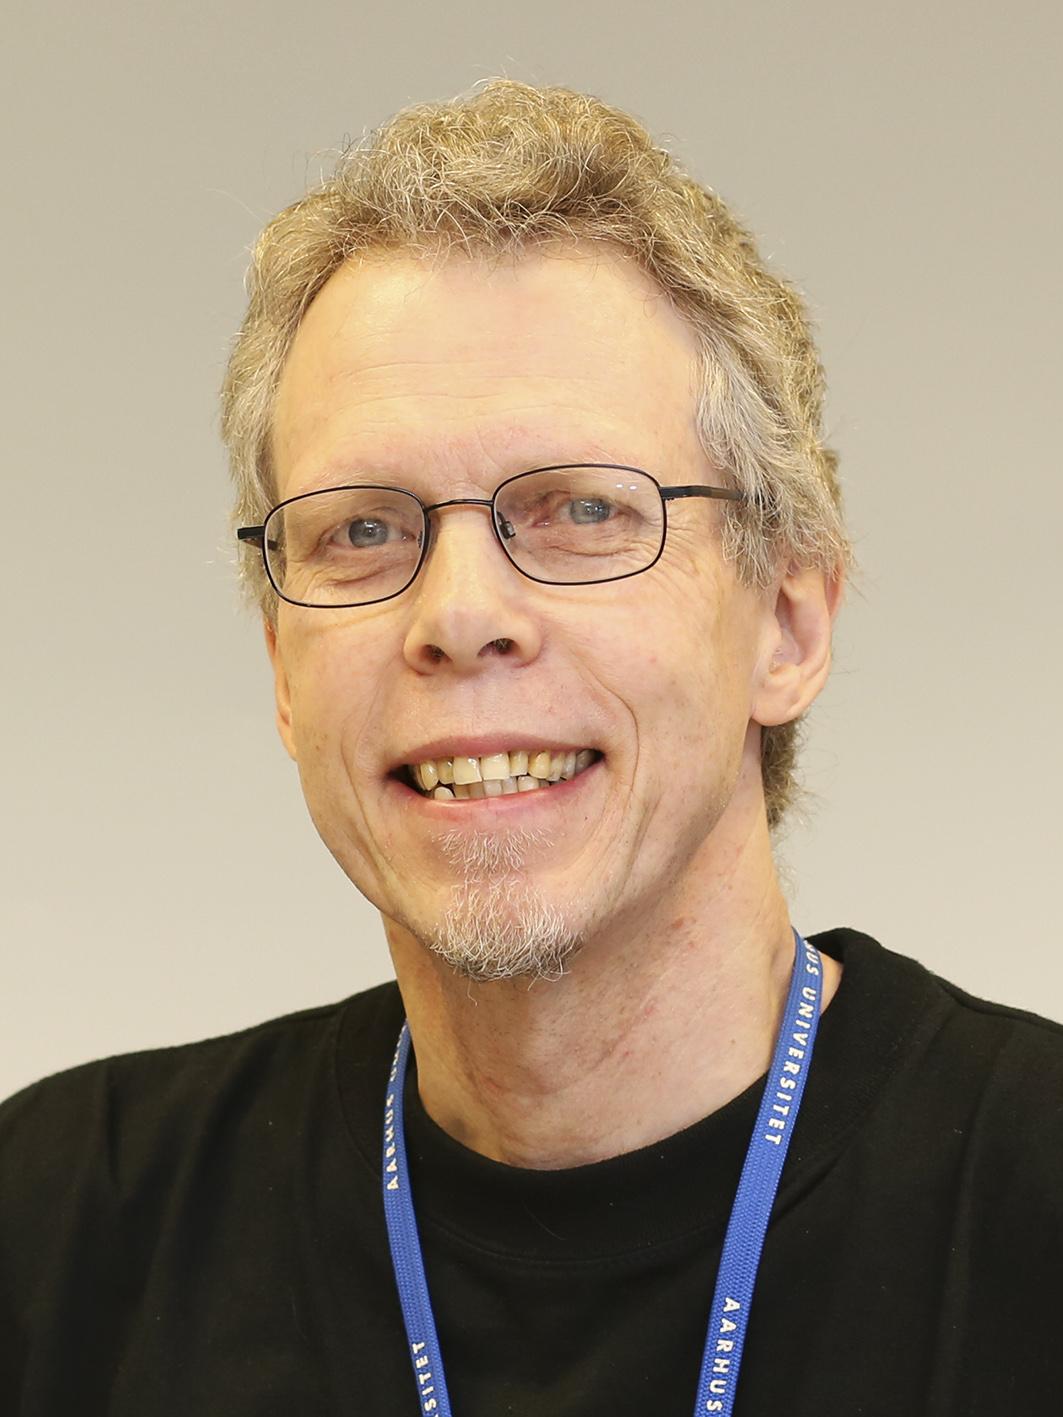 Erik Martin Mortensen